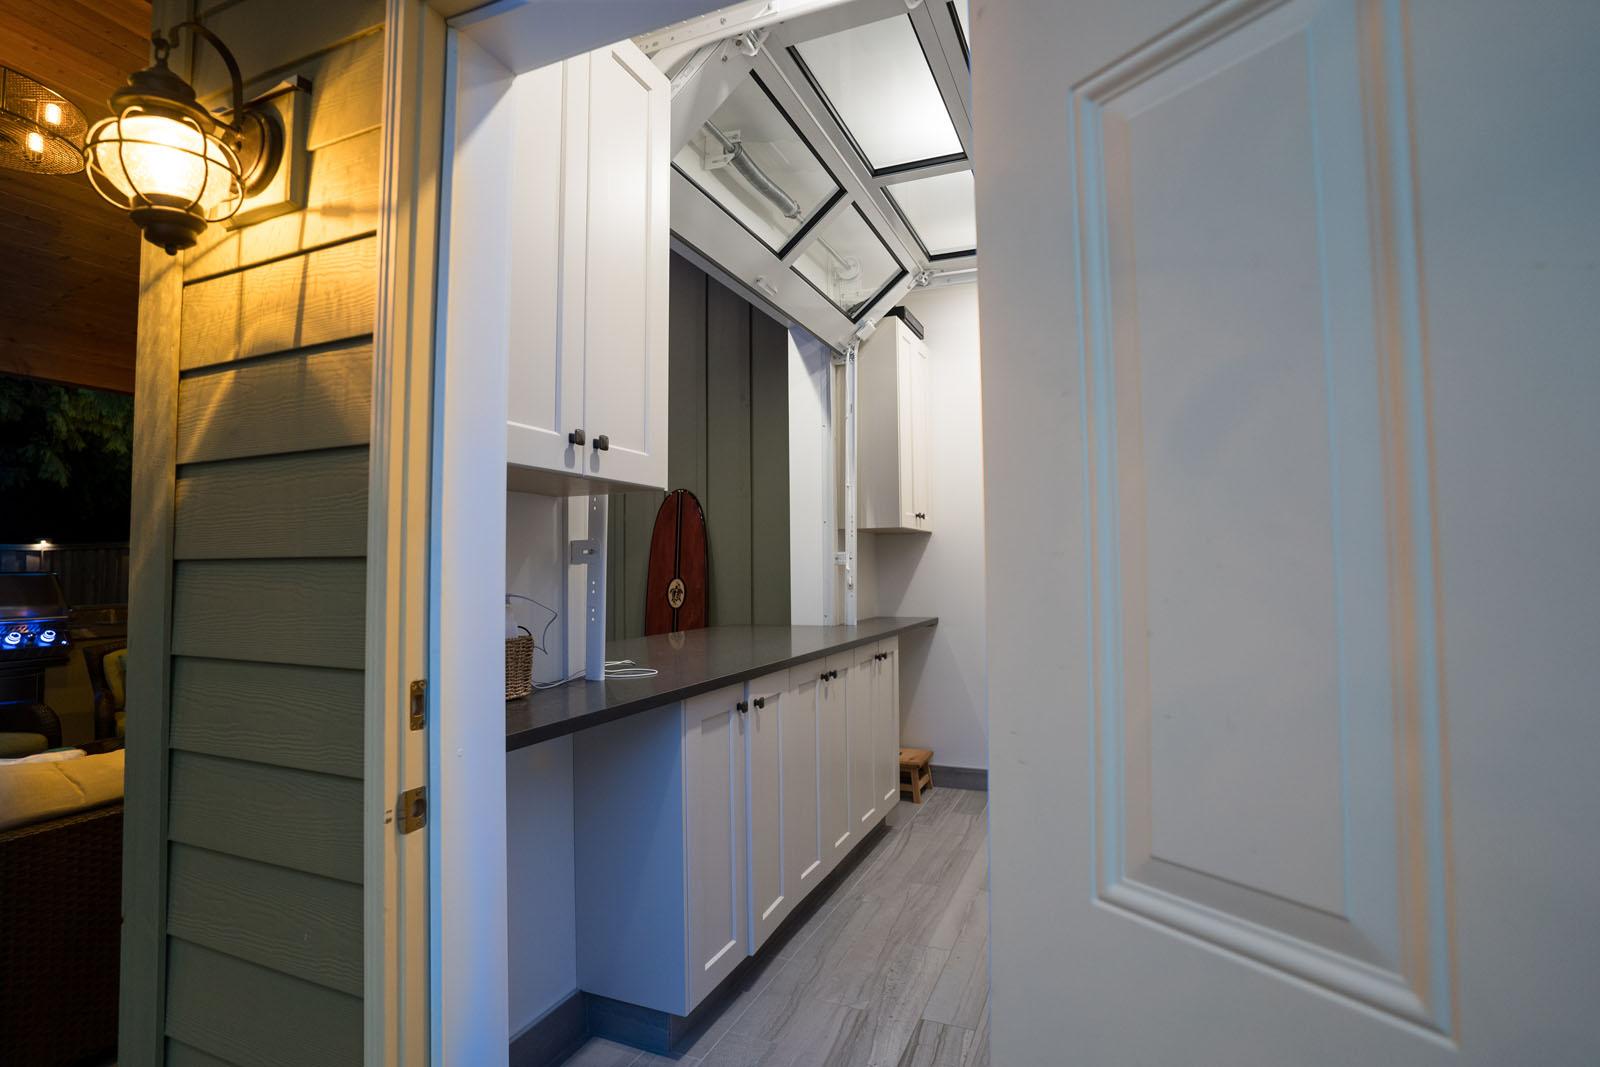 cabana-kitchen-azuro-LEH032